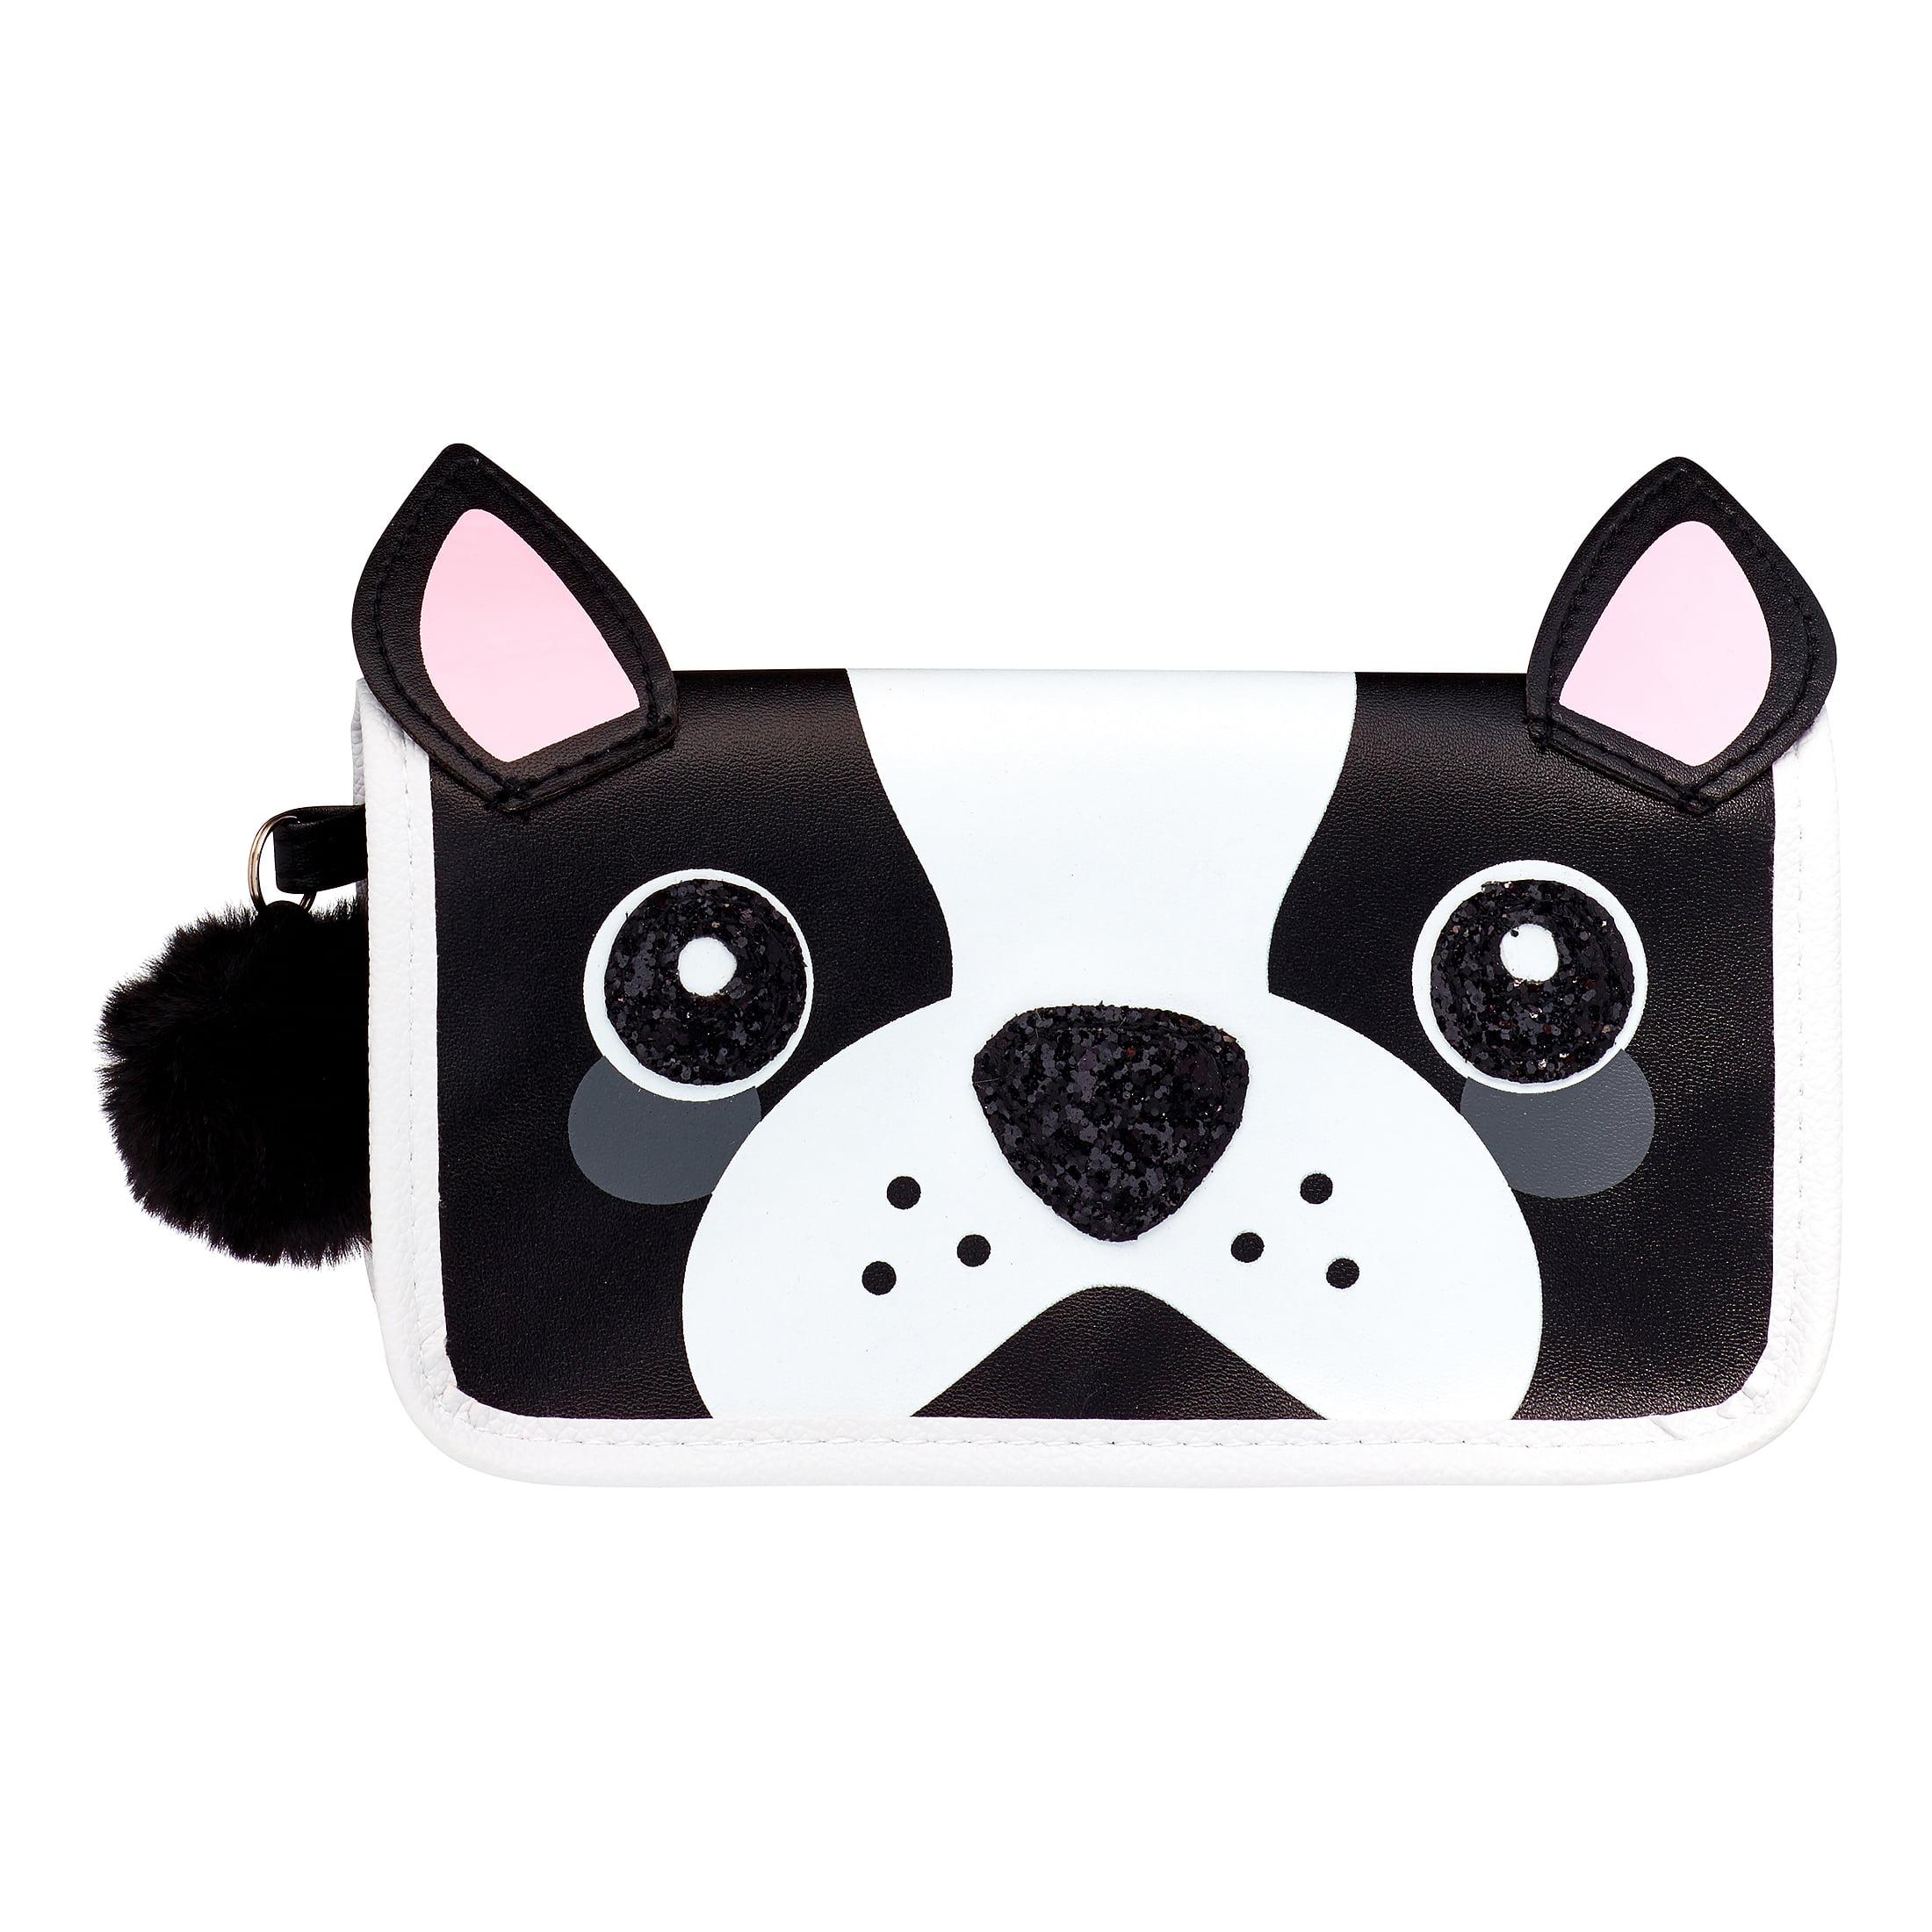 U Style Critter Clutch Bag with Pom Pom, Dog ($11 Value)